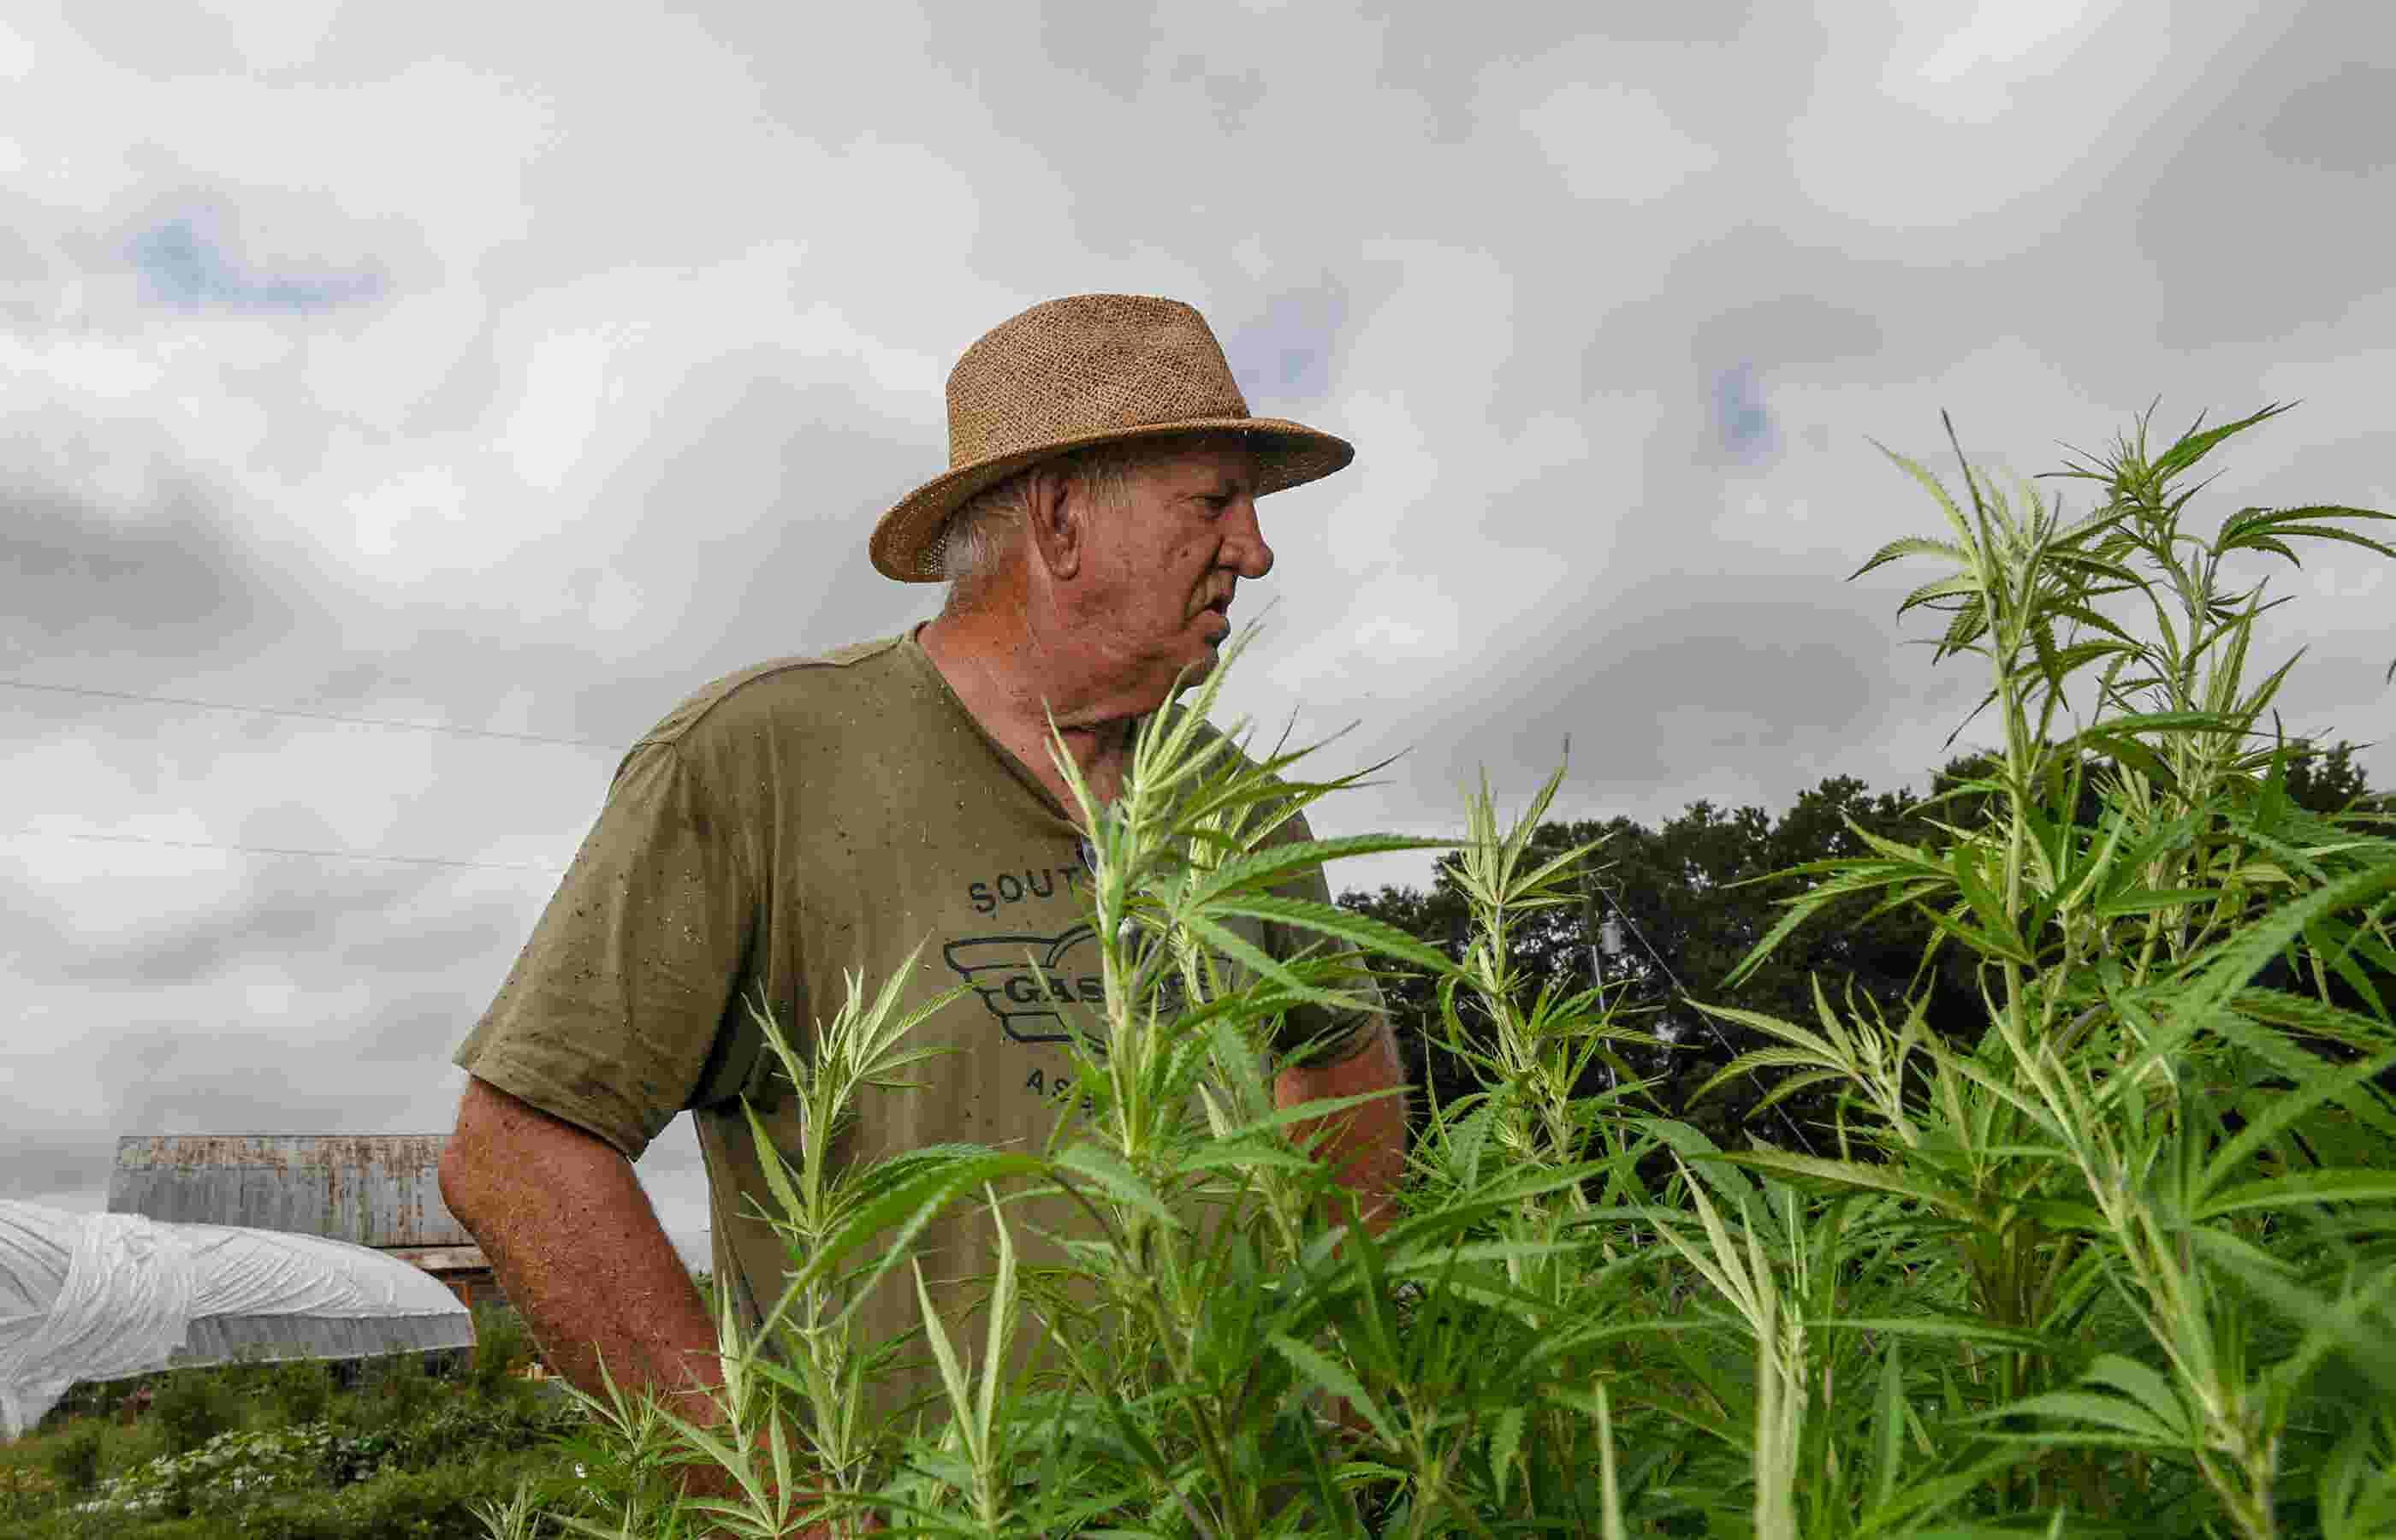 Inagural SC hemp crop challenges chosen former Clemson coach and farmer  Danny Ford f082f19ac32b